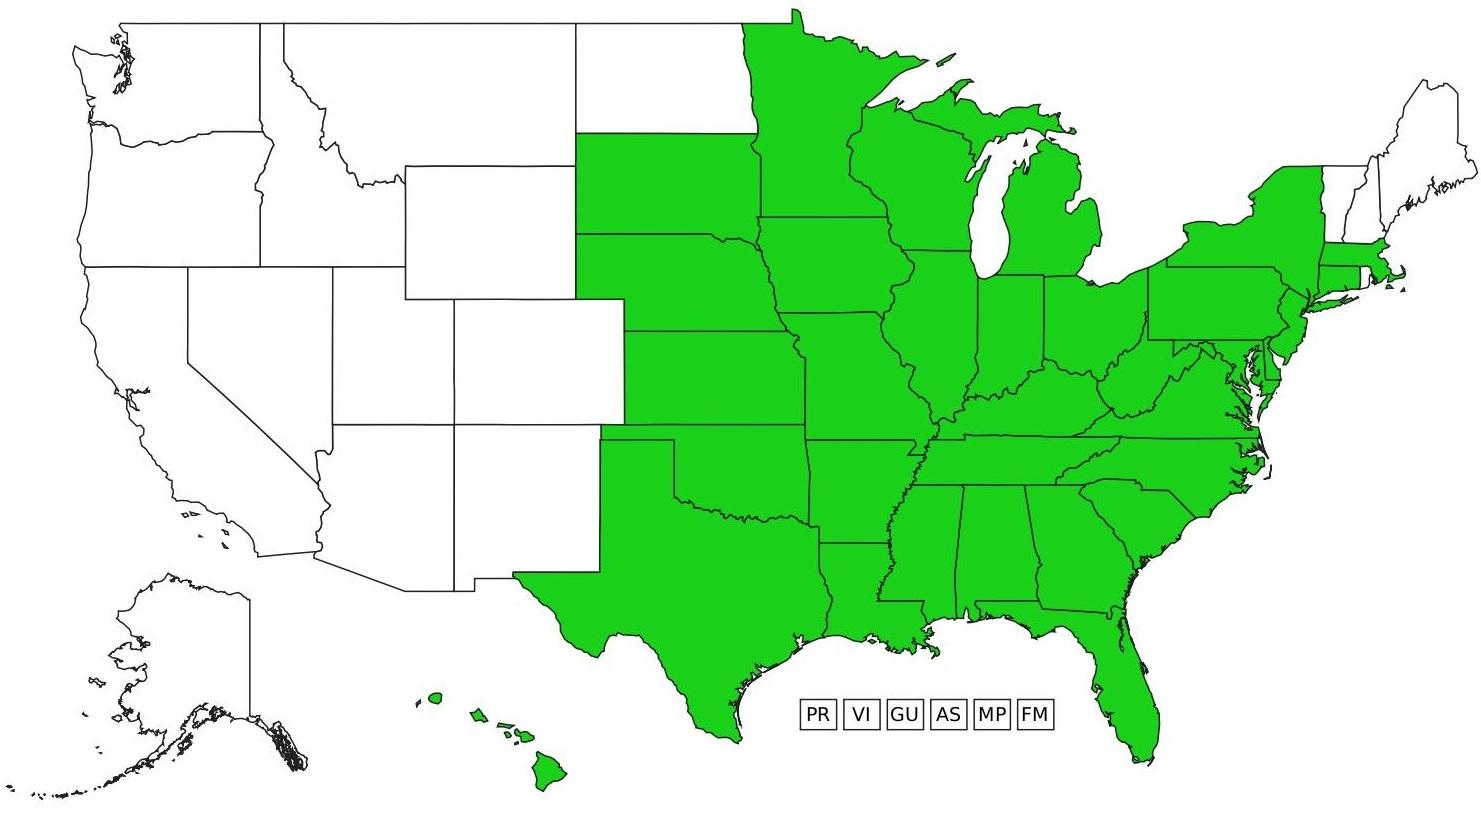 Figure 1: Distribution of sericea lespedeza in the United States (eddmaps 2019)